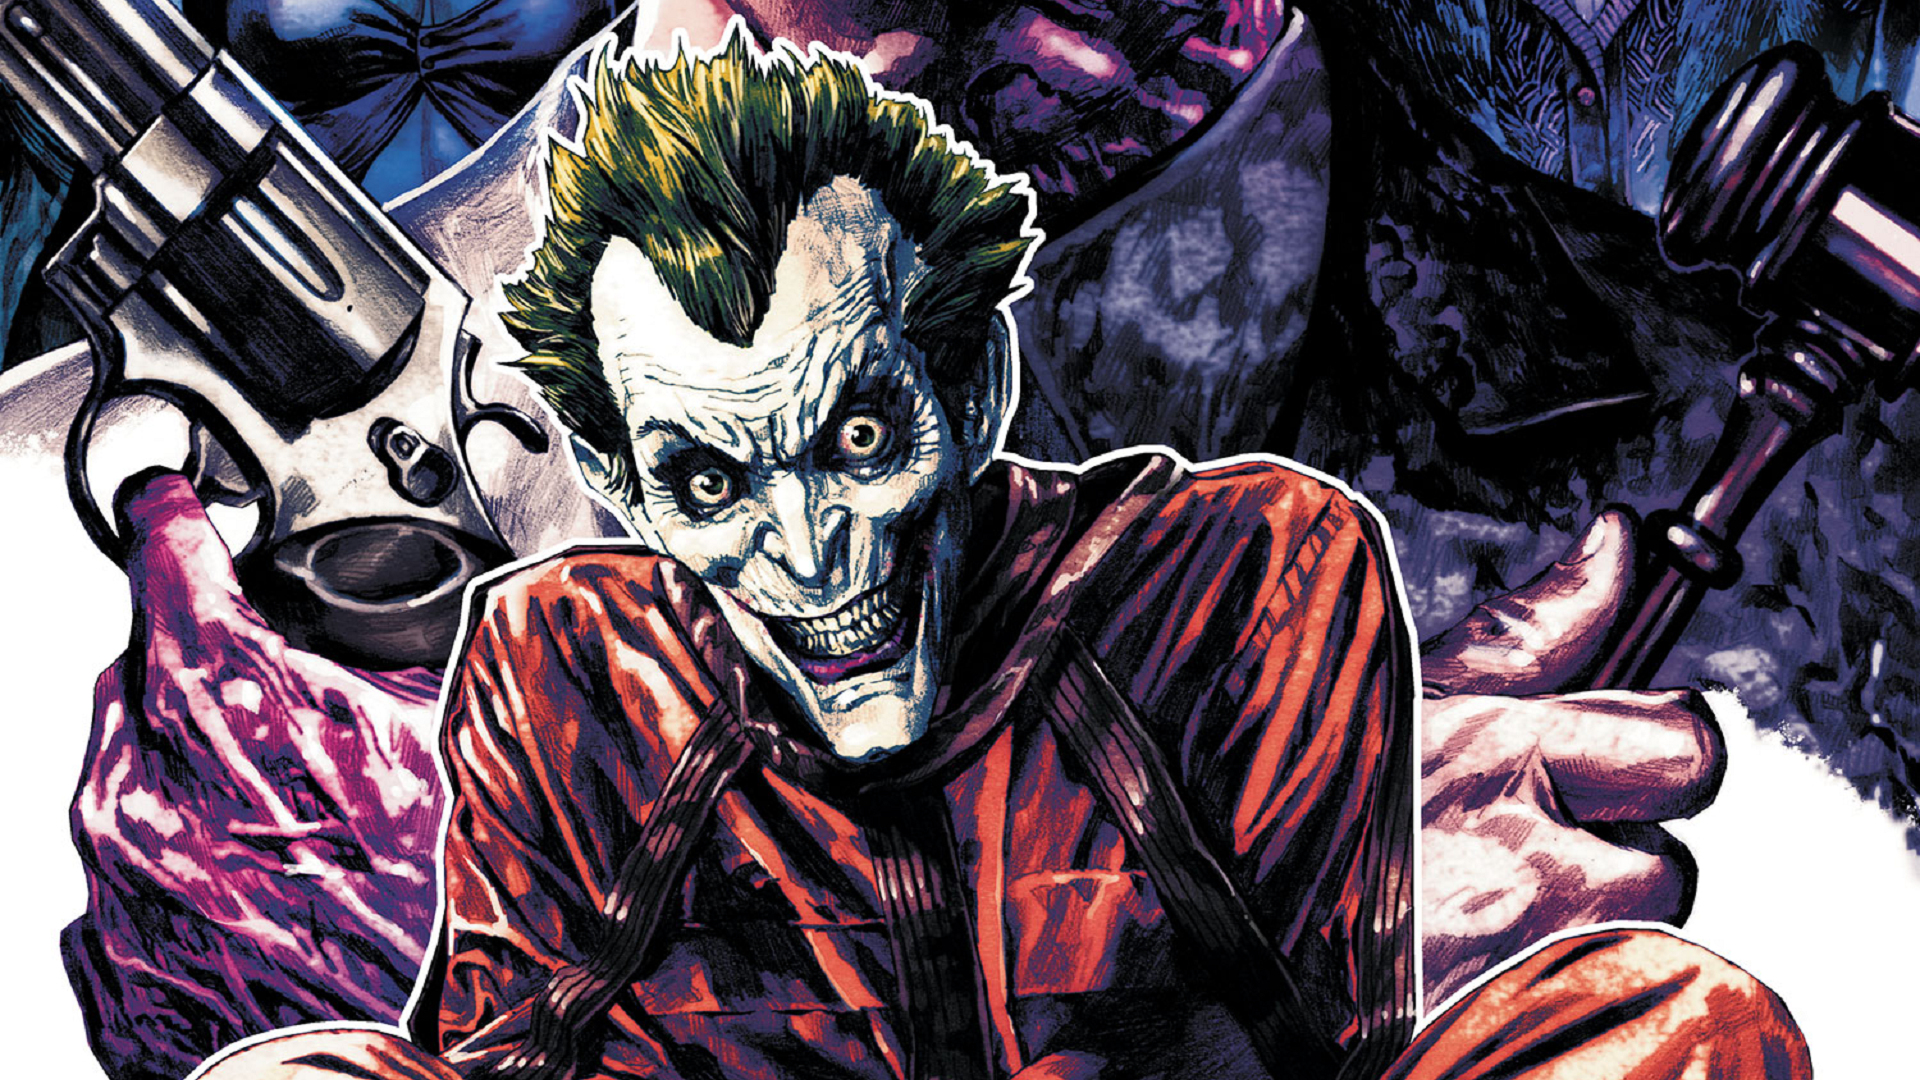 5 Batman: Arkham Unhinged HD Wallpapers | Backgrounds ... Batman Comic Cover Wallpaper